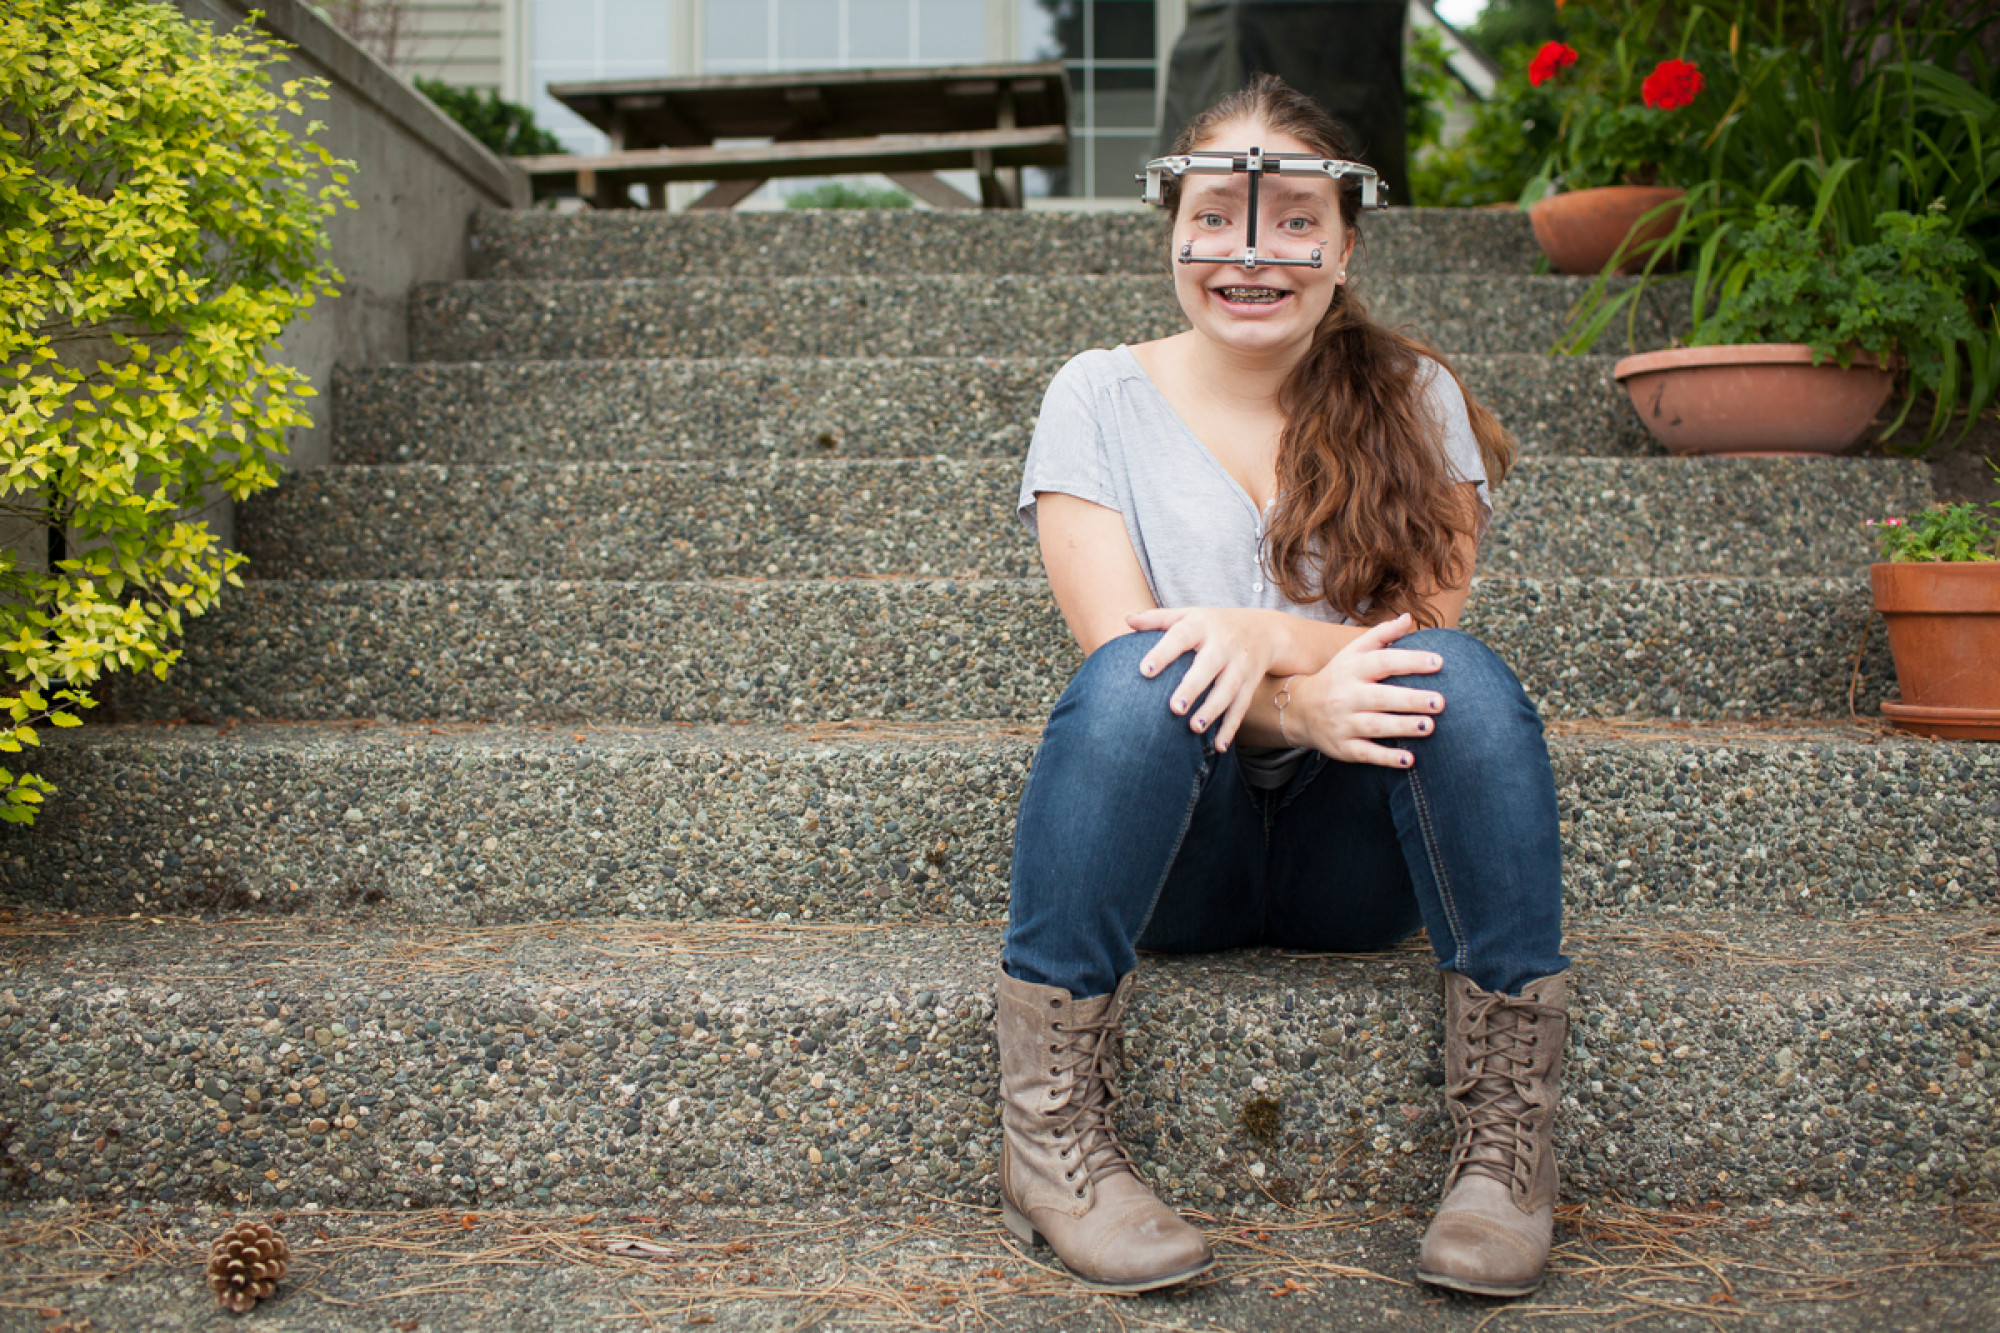 treacher collins syndrome essay